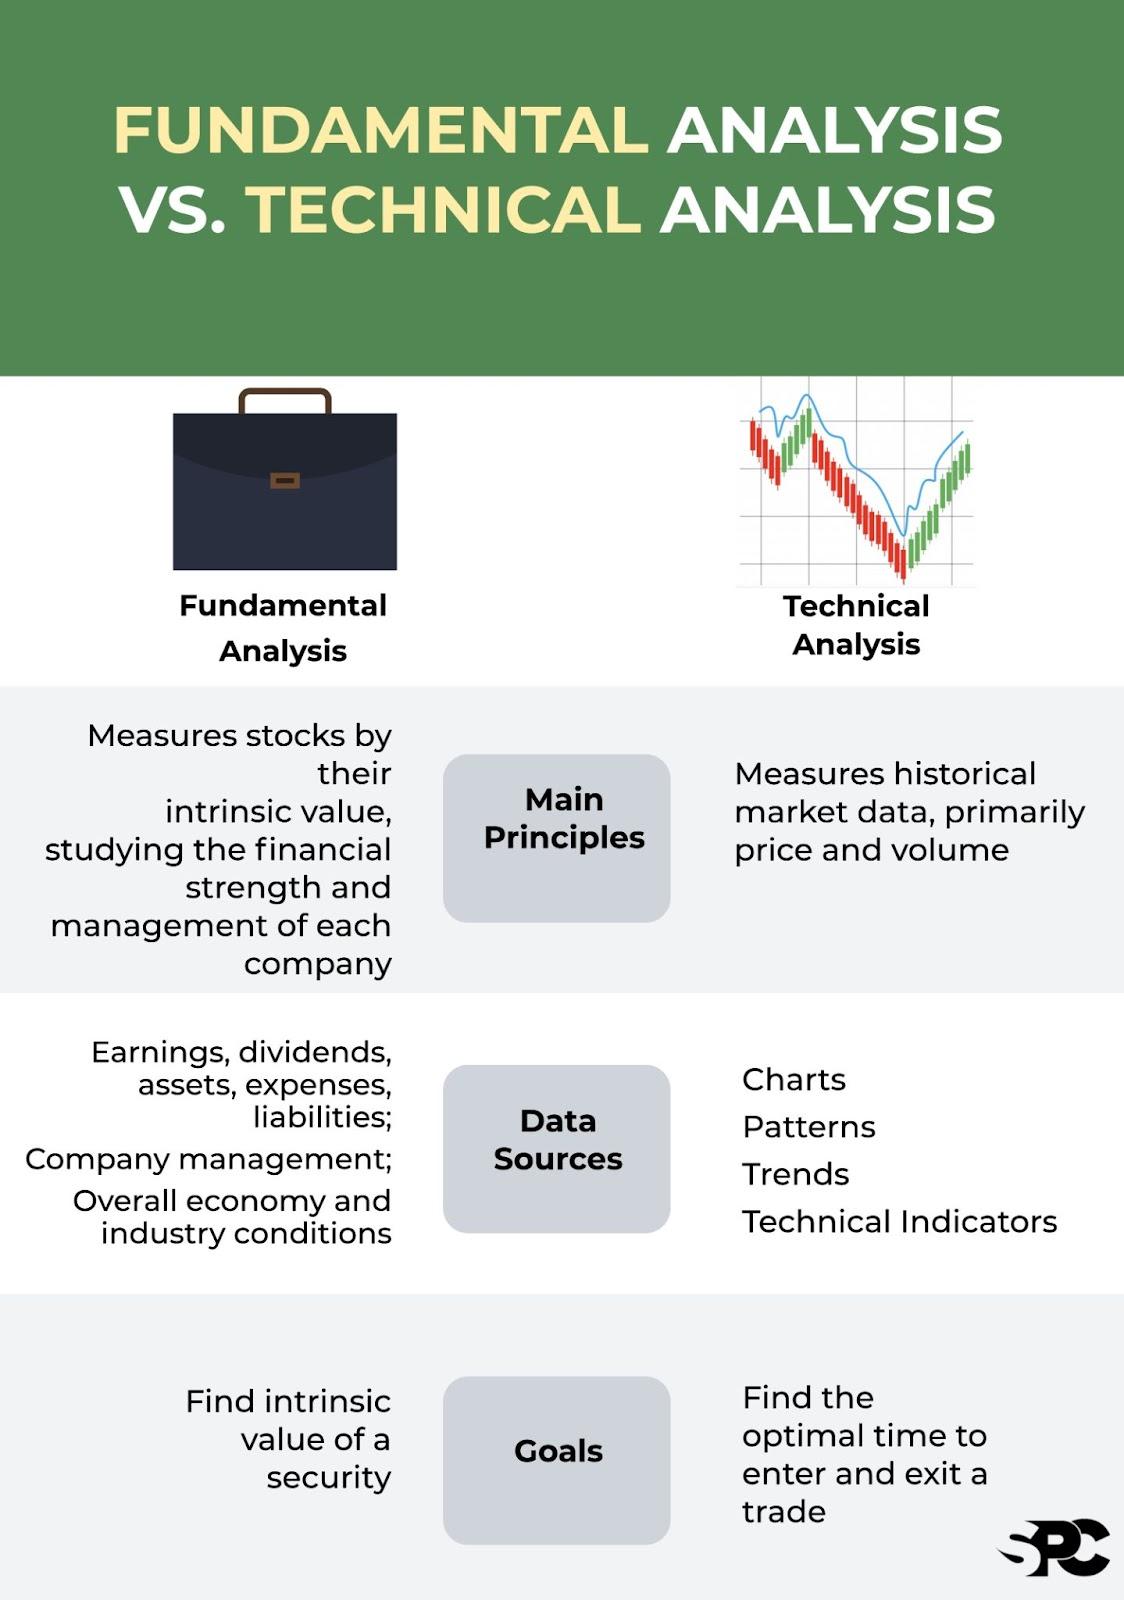 fundamental analysis versus technical analysis infographic